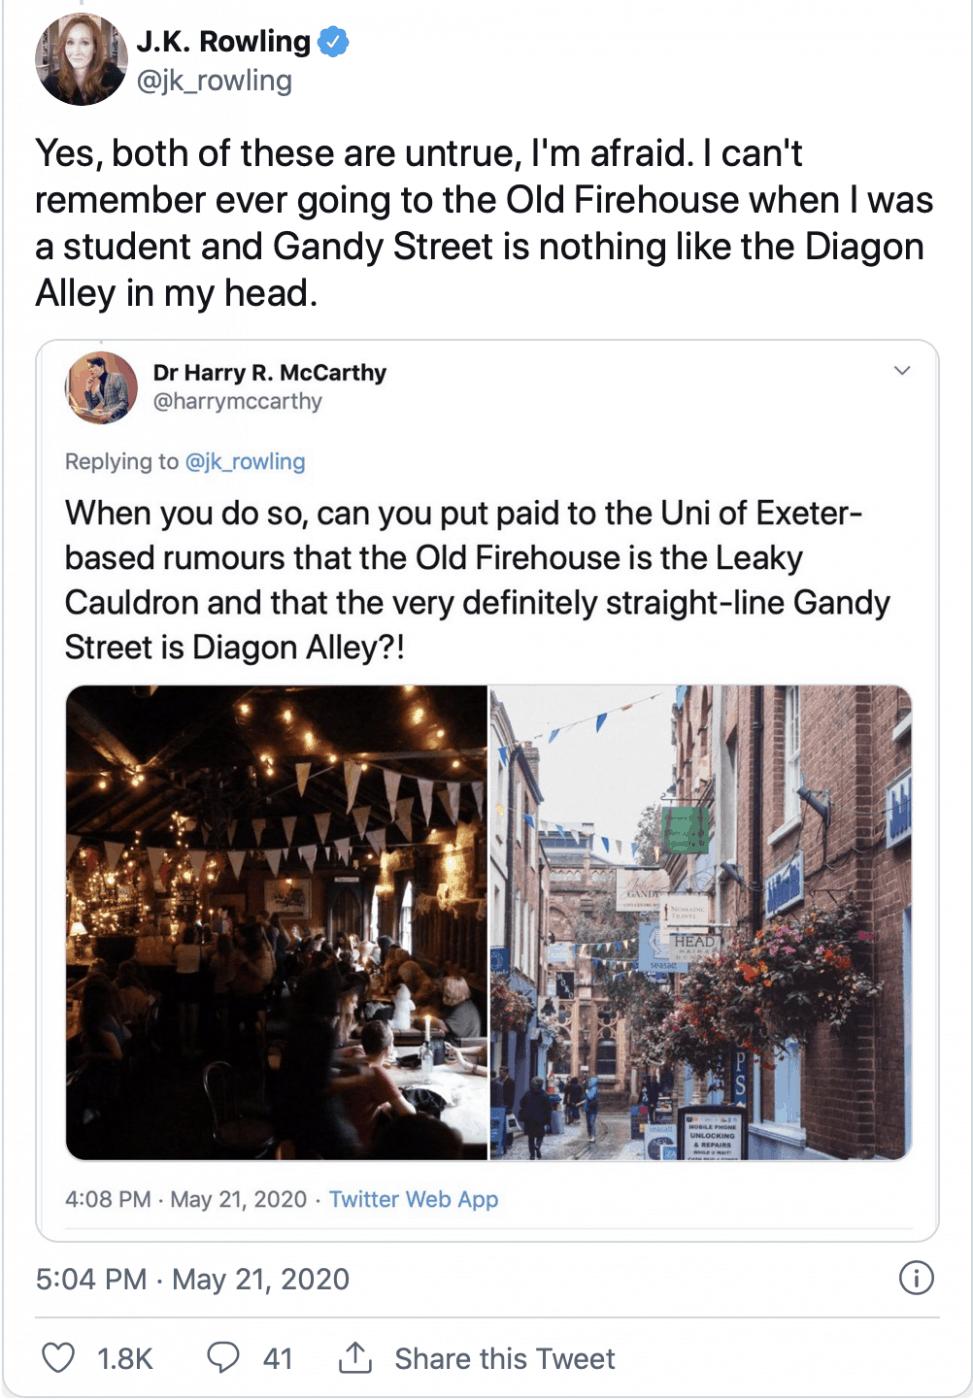 J K Rowling Gandy Street Diagon Alley Tweet